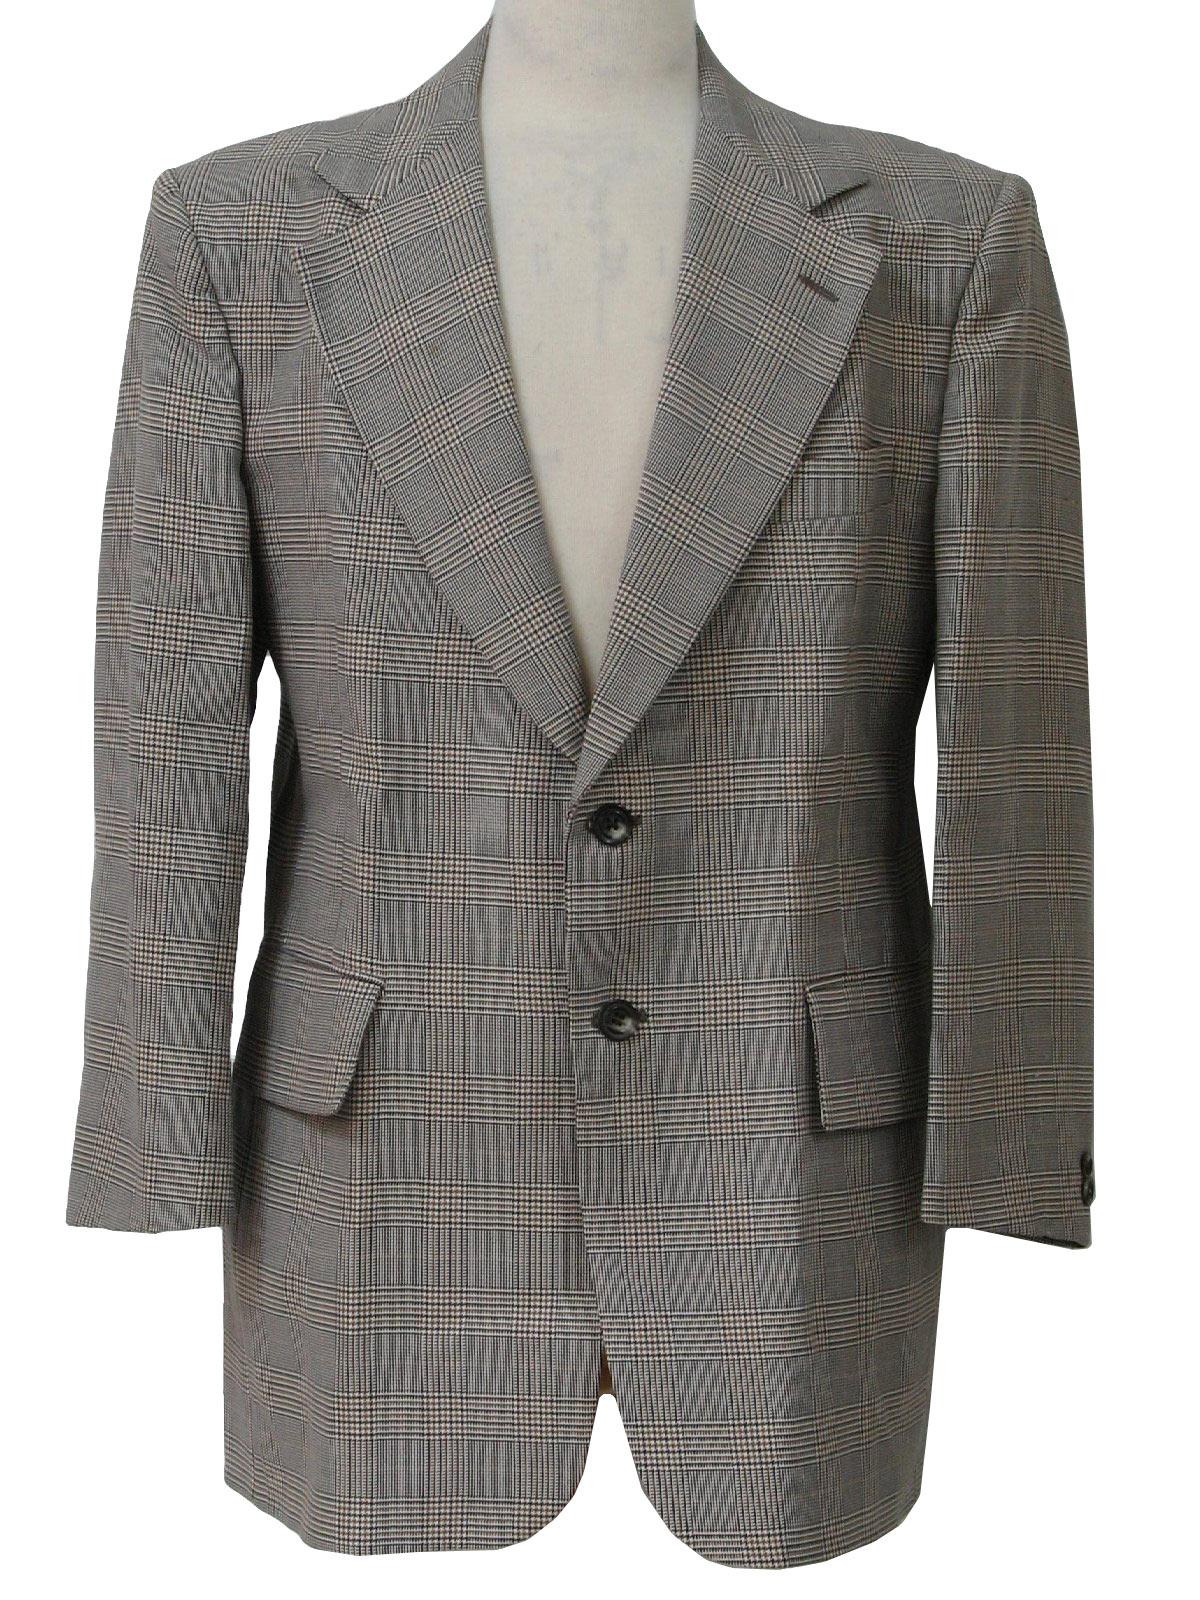 Mens black and white sport coat